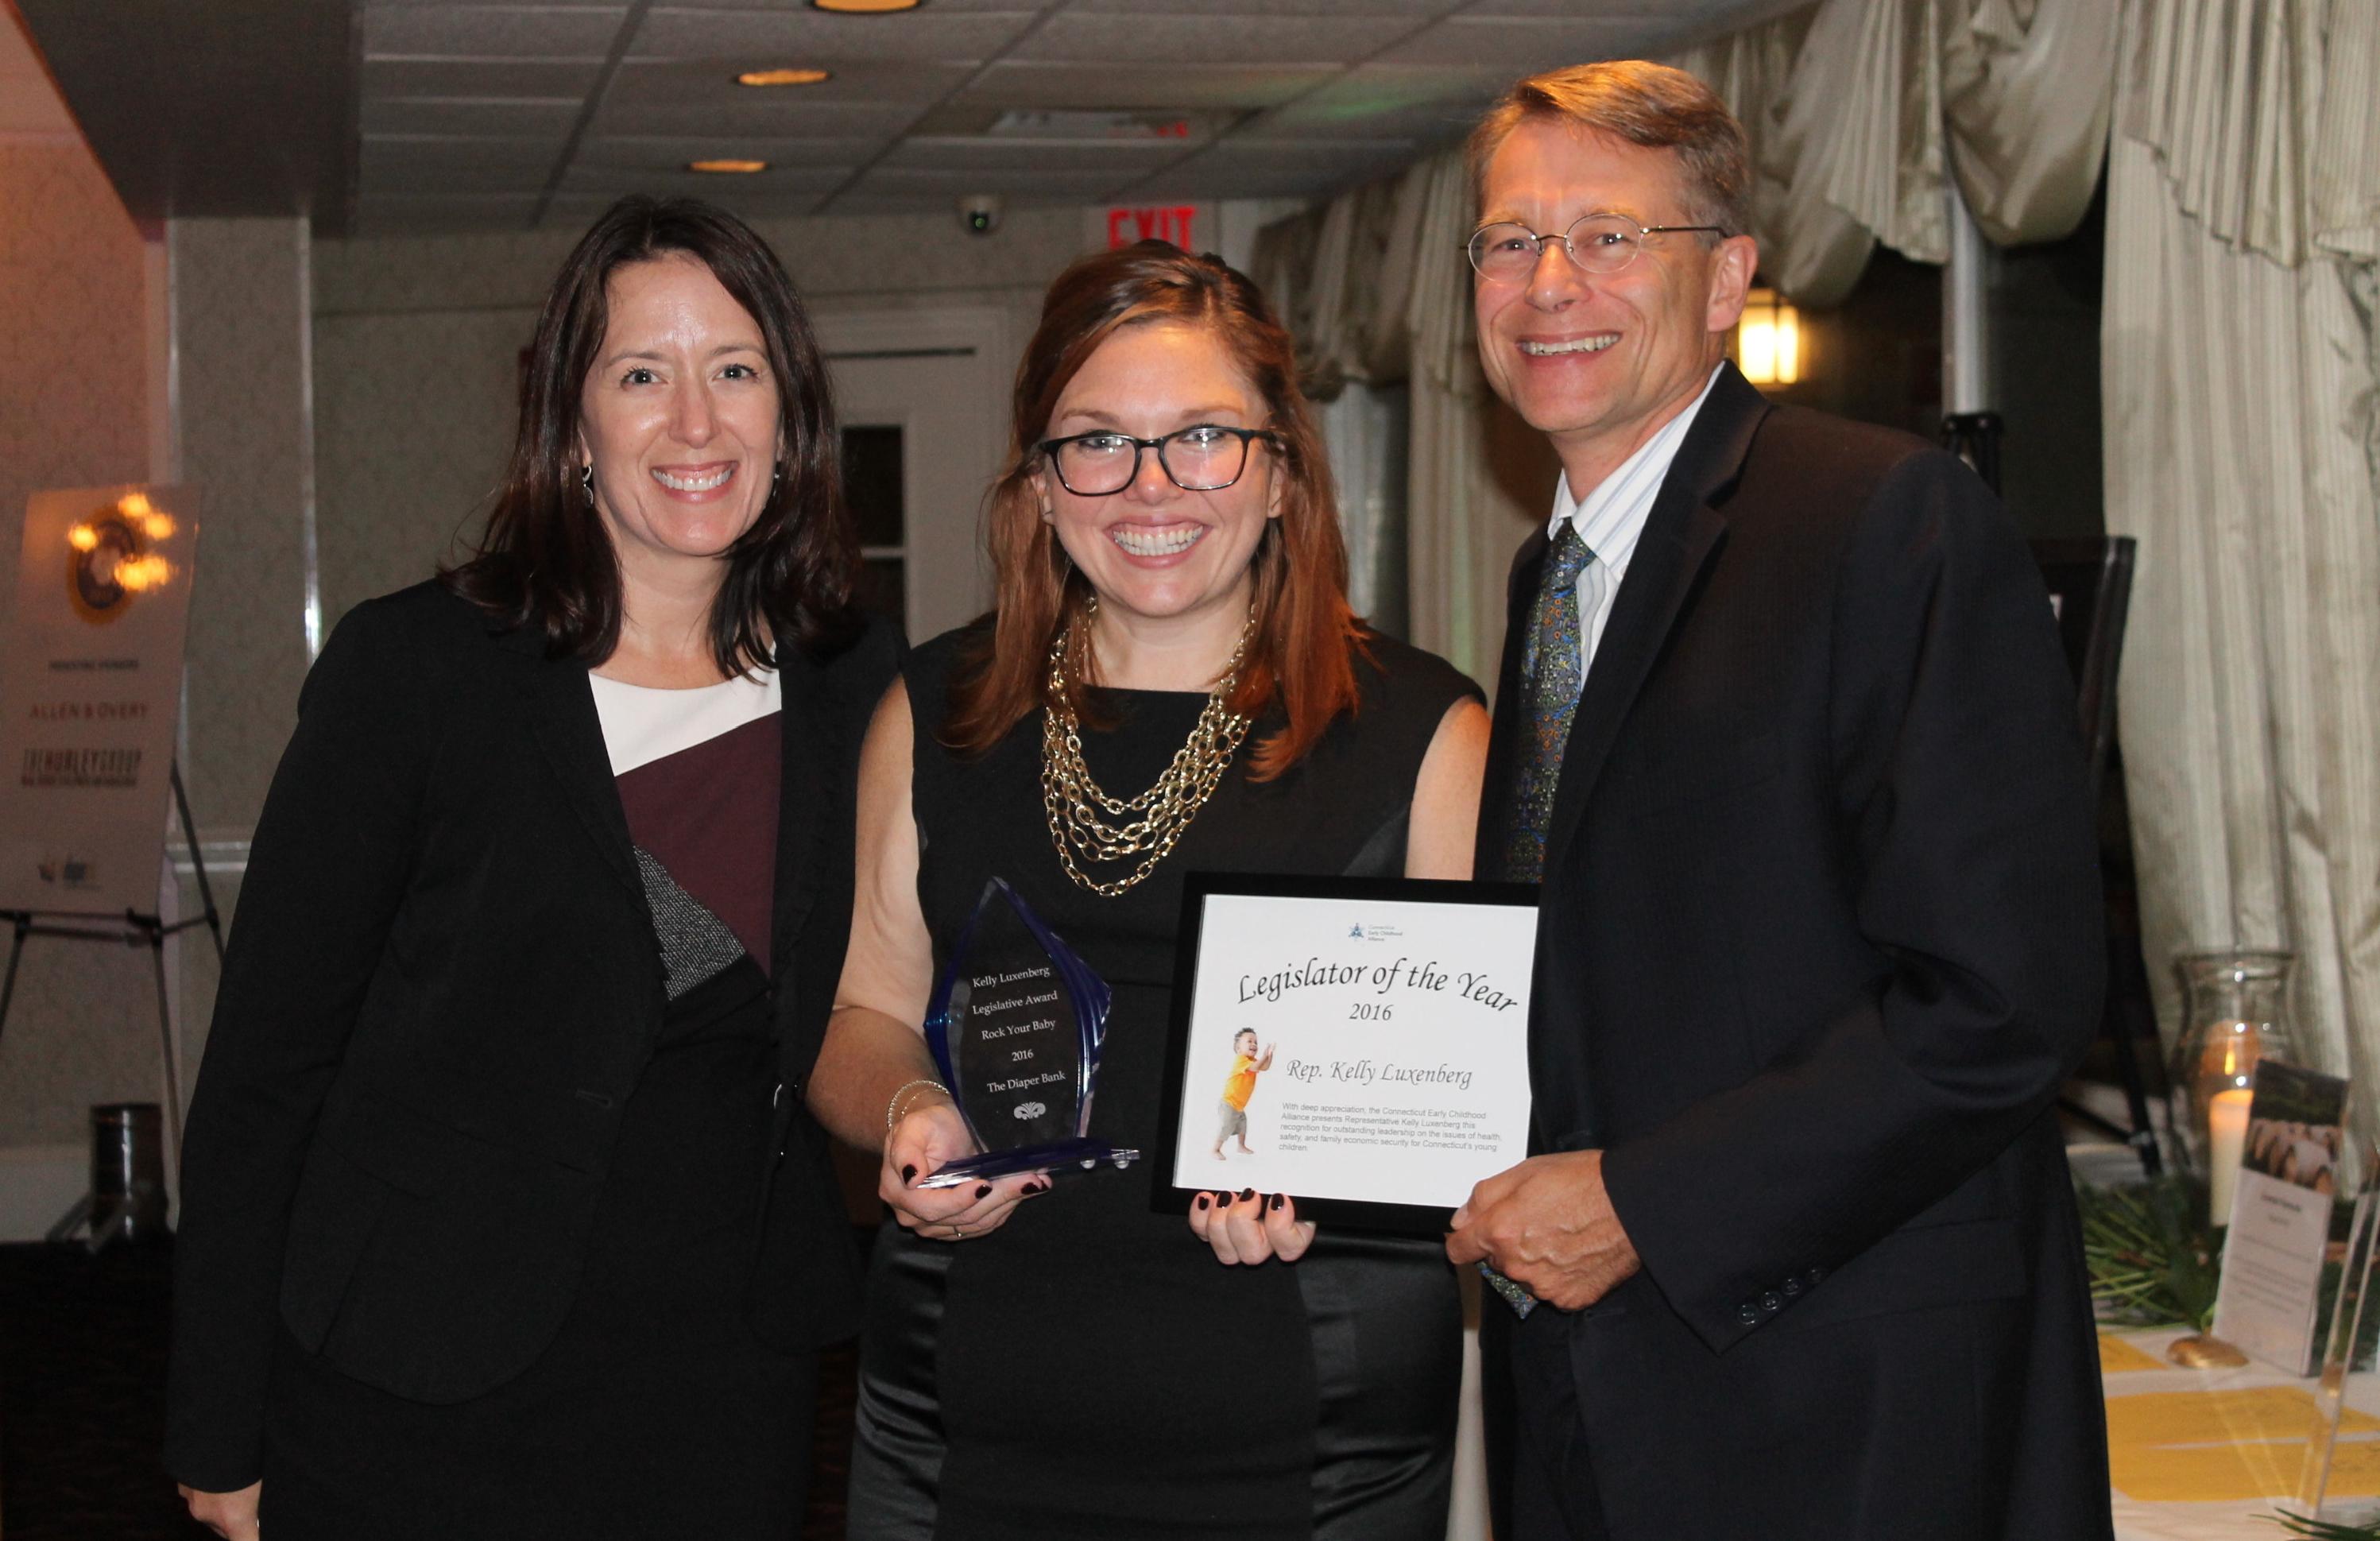 Rep. Kelly Luxenberg, Legislator of the Year